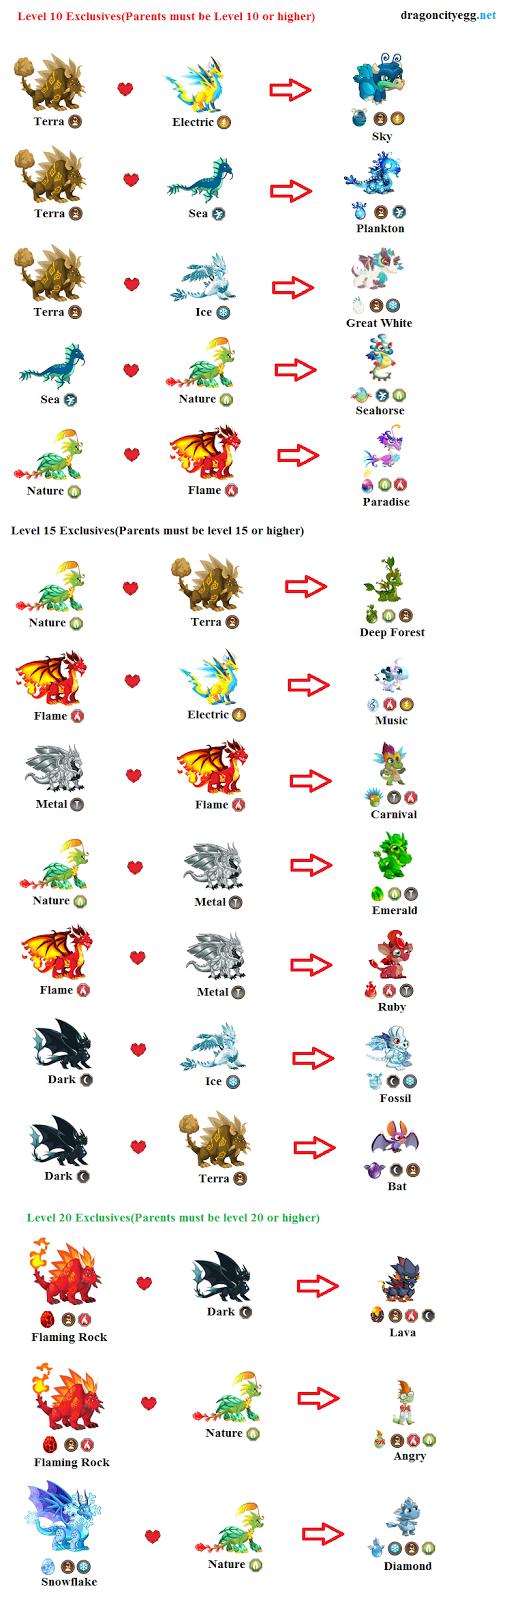 Dragon City Breeding Chart Exclusive Dragons